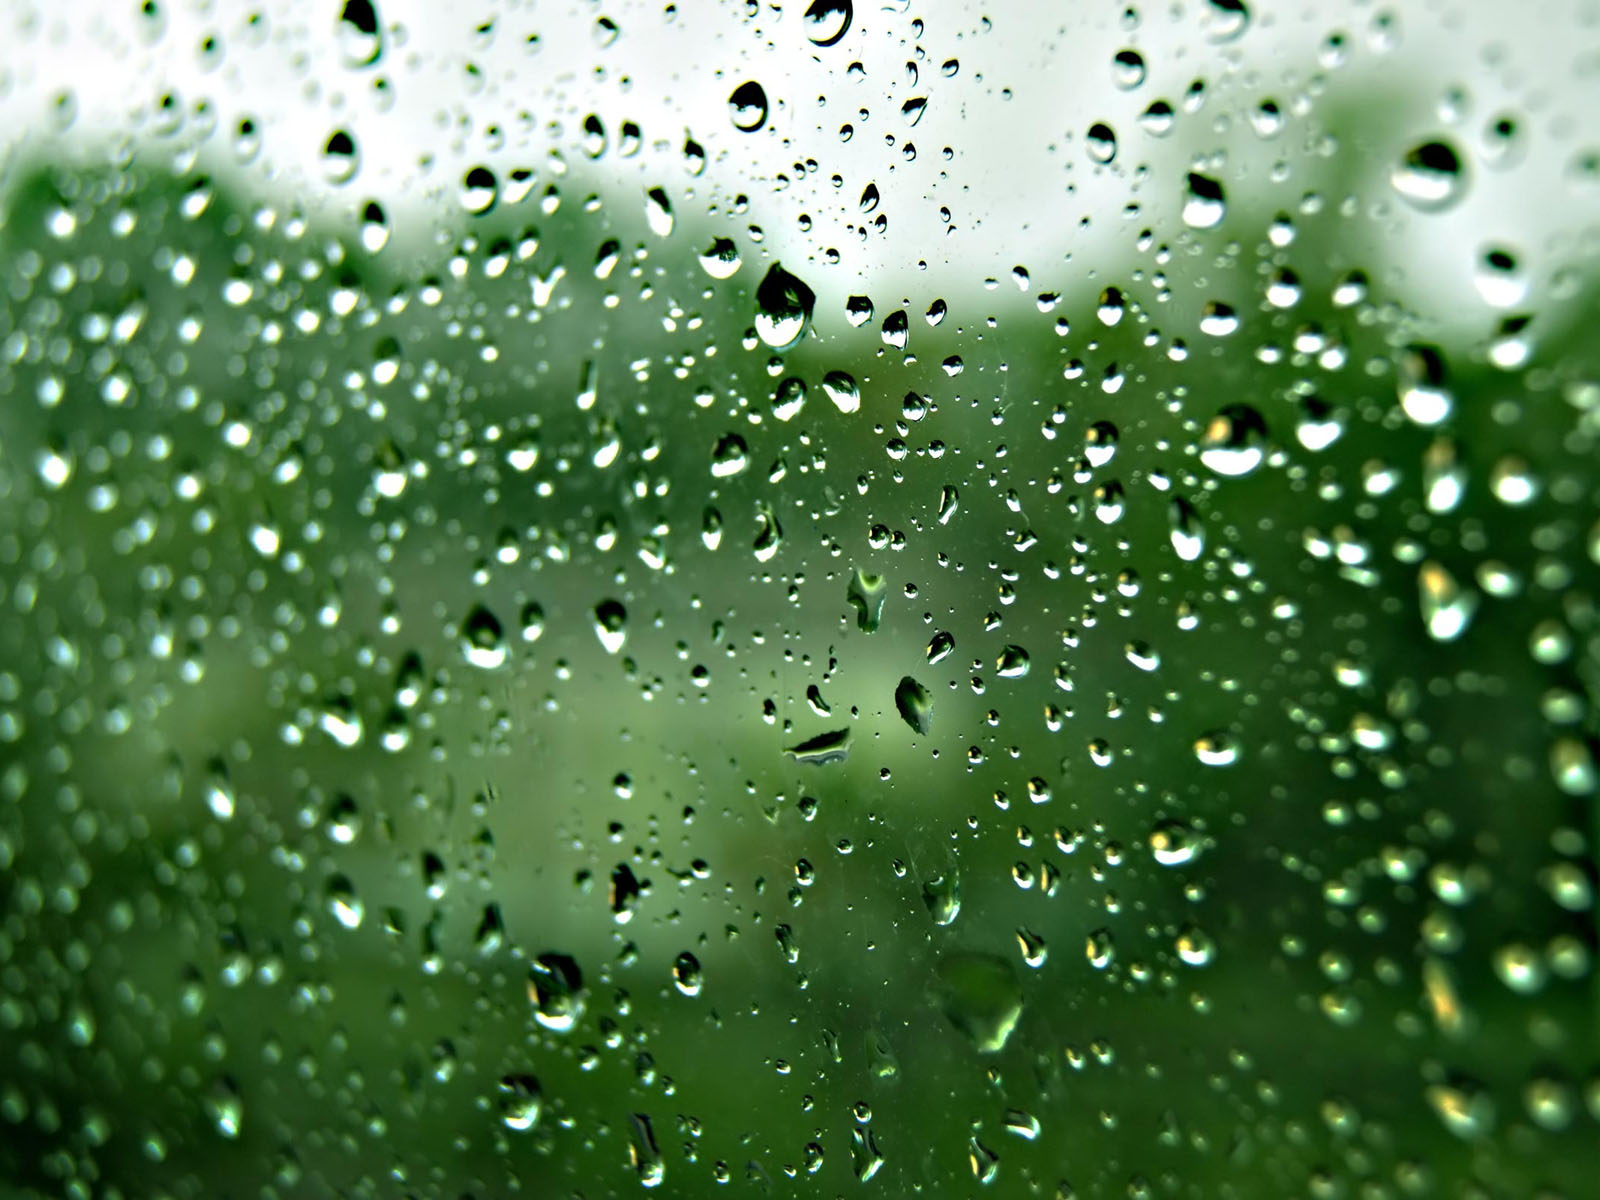 Tarzan Car Wallpaper Free Download Wallpapers Rain Drops On Glass Wallpapers